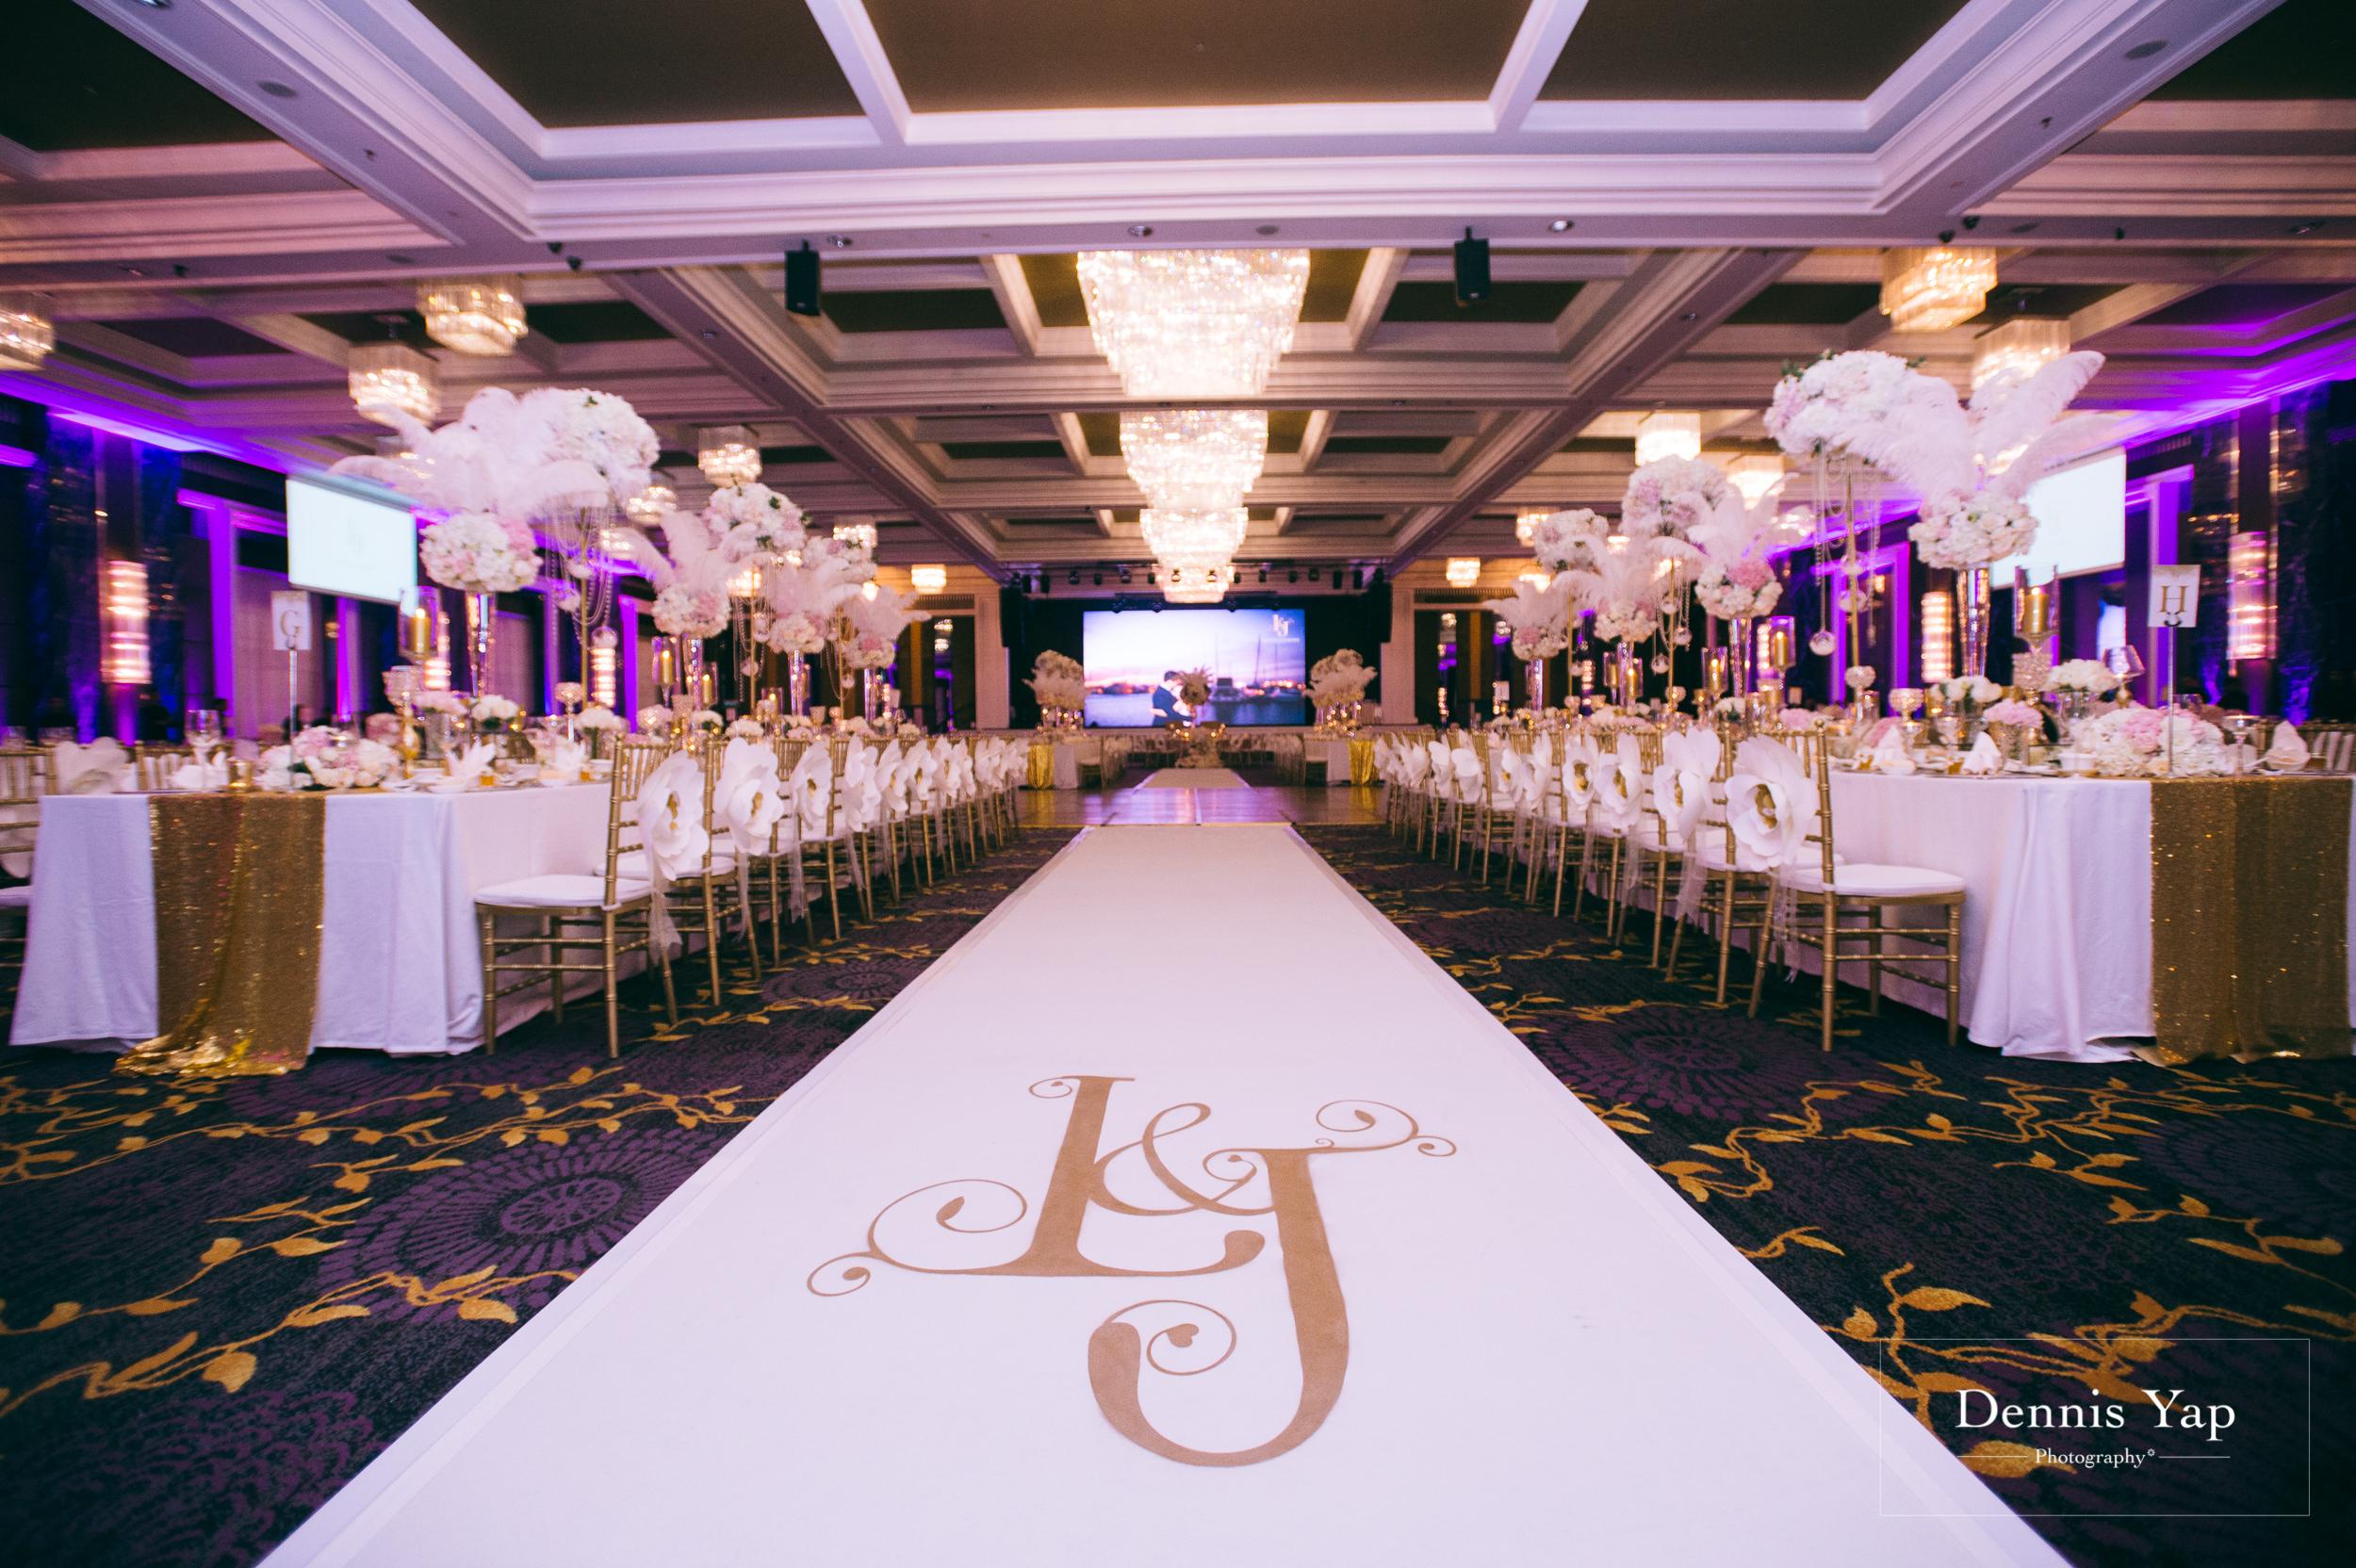 lionel joanne garden wedding majestic hotel dennis yap photography malaysia top wedding photographer-73.jpg